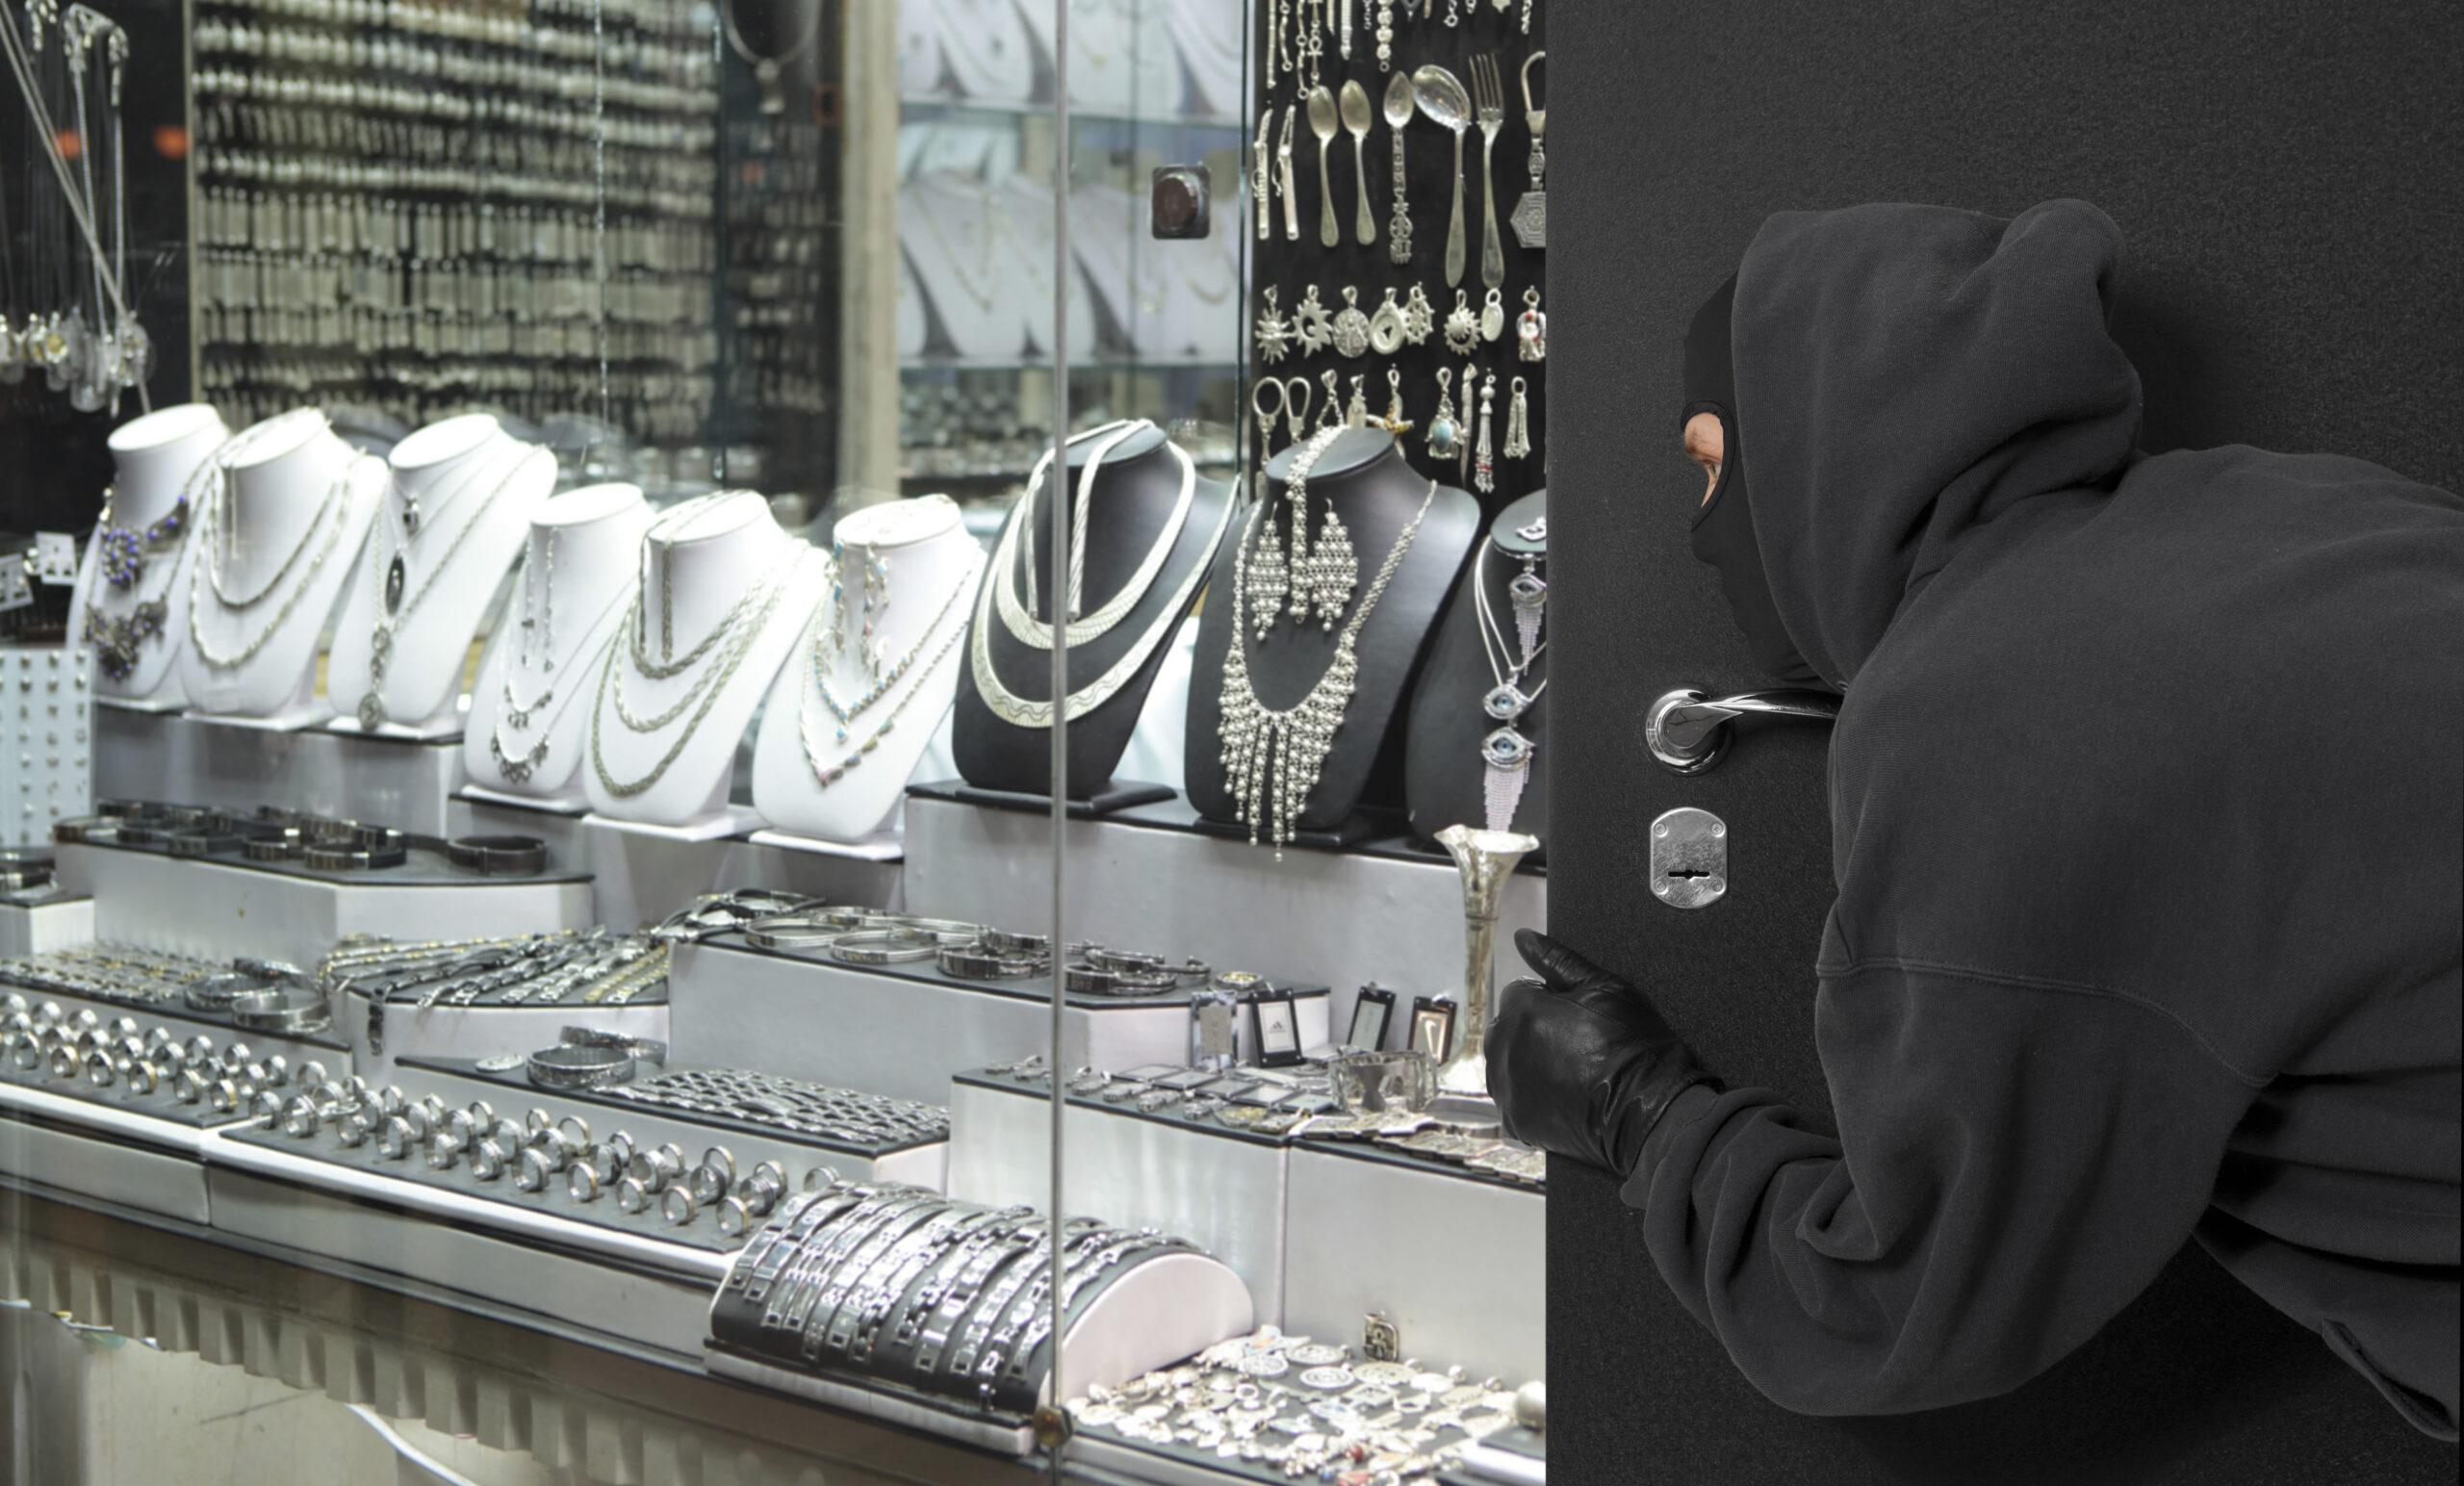 Shop Burglary